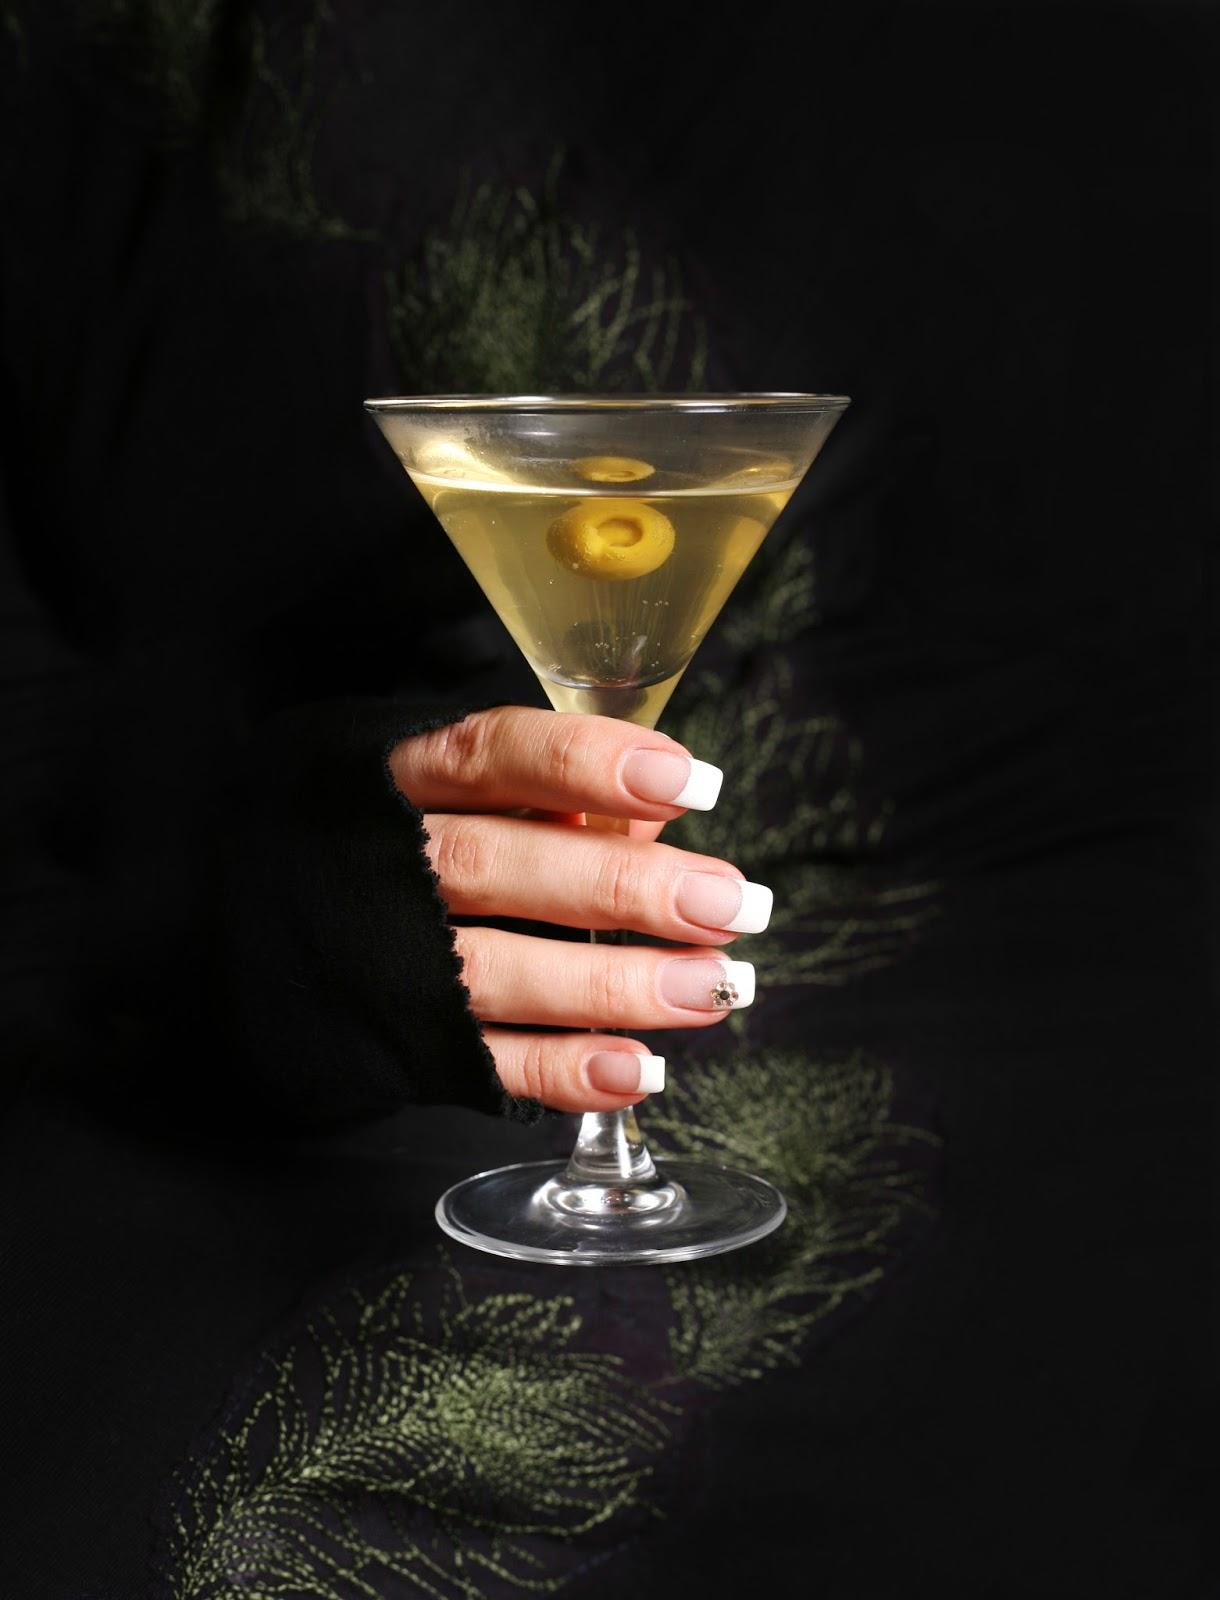 Cozy Chicks: In search of the perfect martini